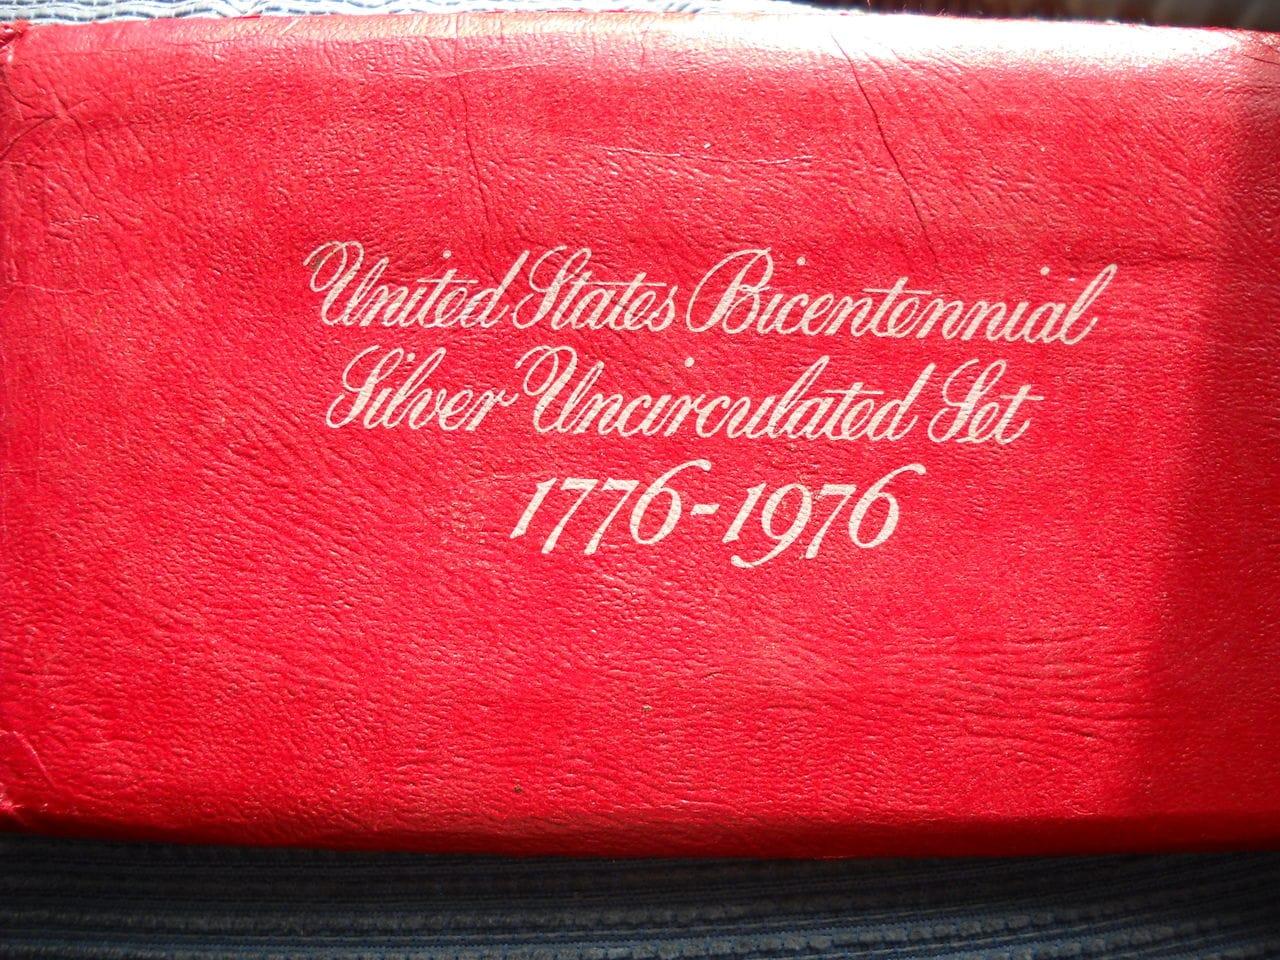 1776-1976 United States Bicentienal DSCN0073